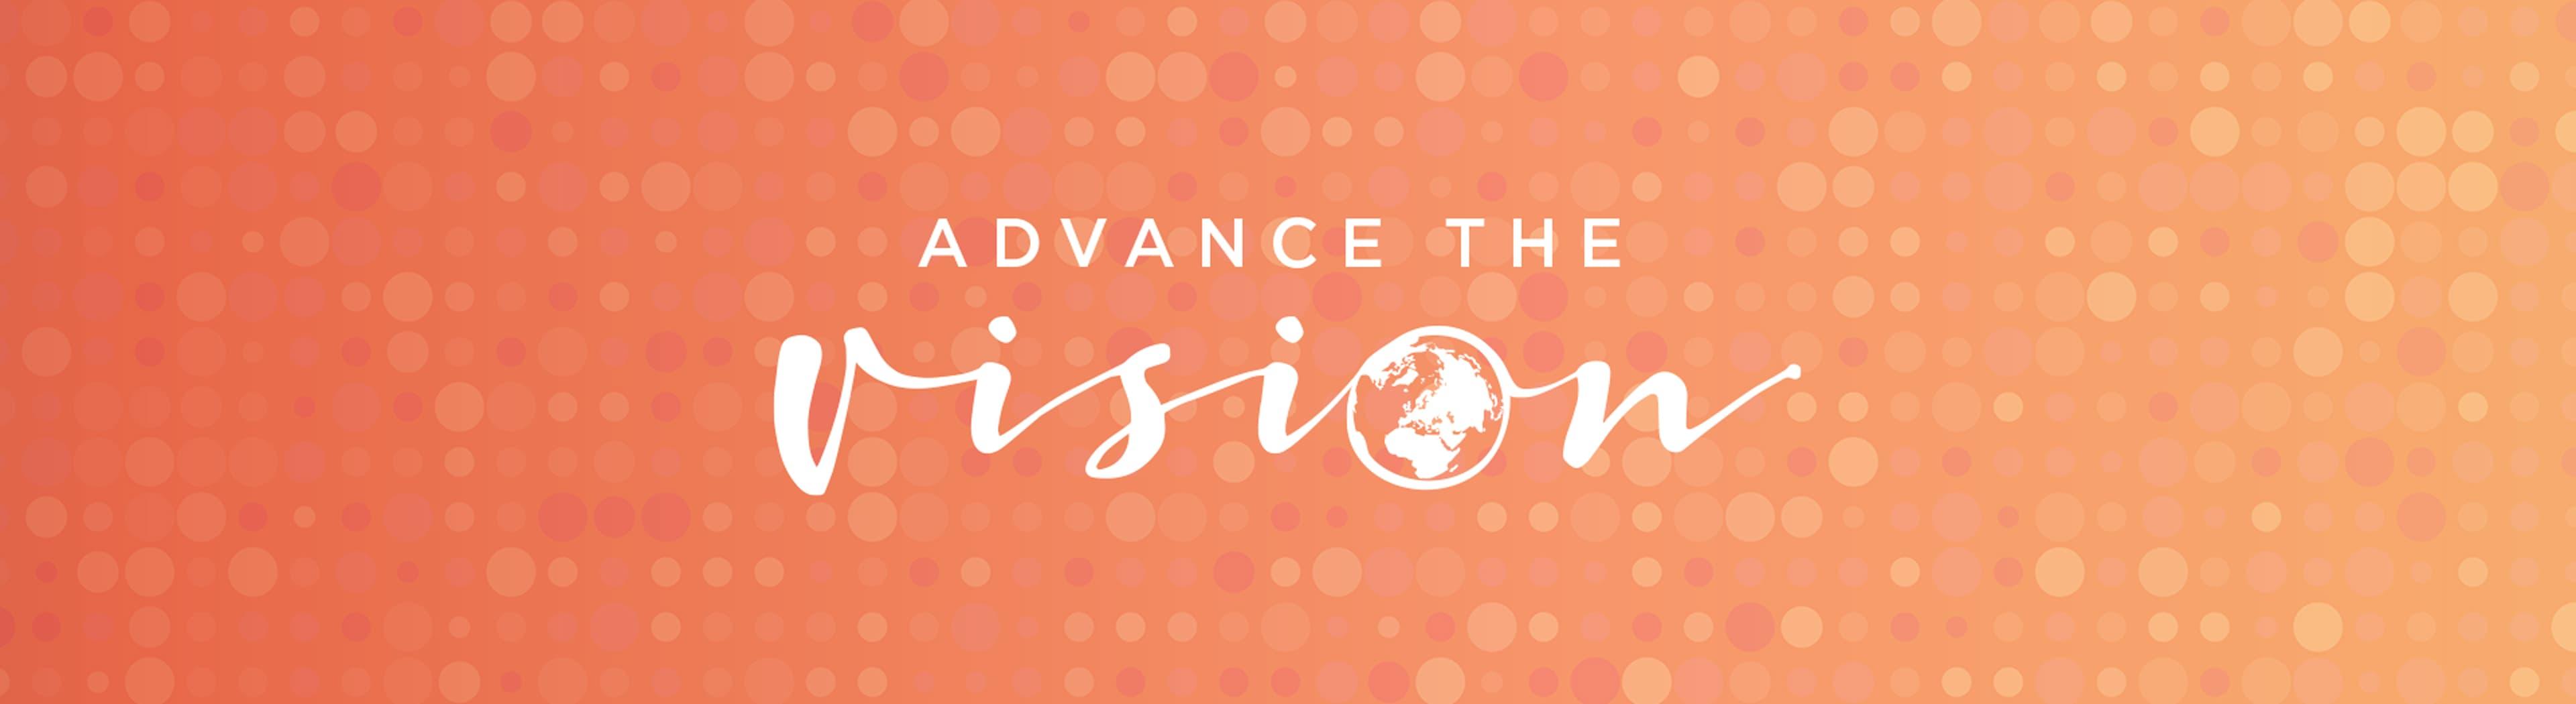 Advance the Vision main banner